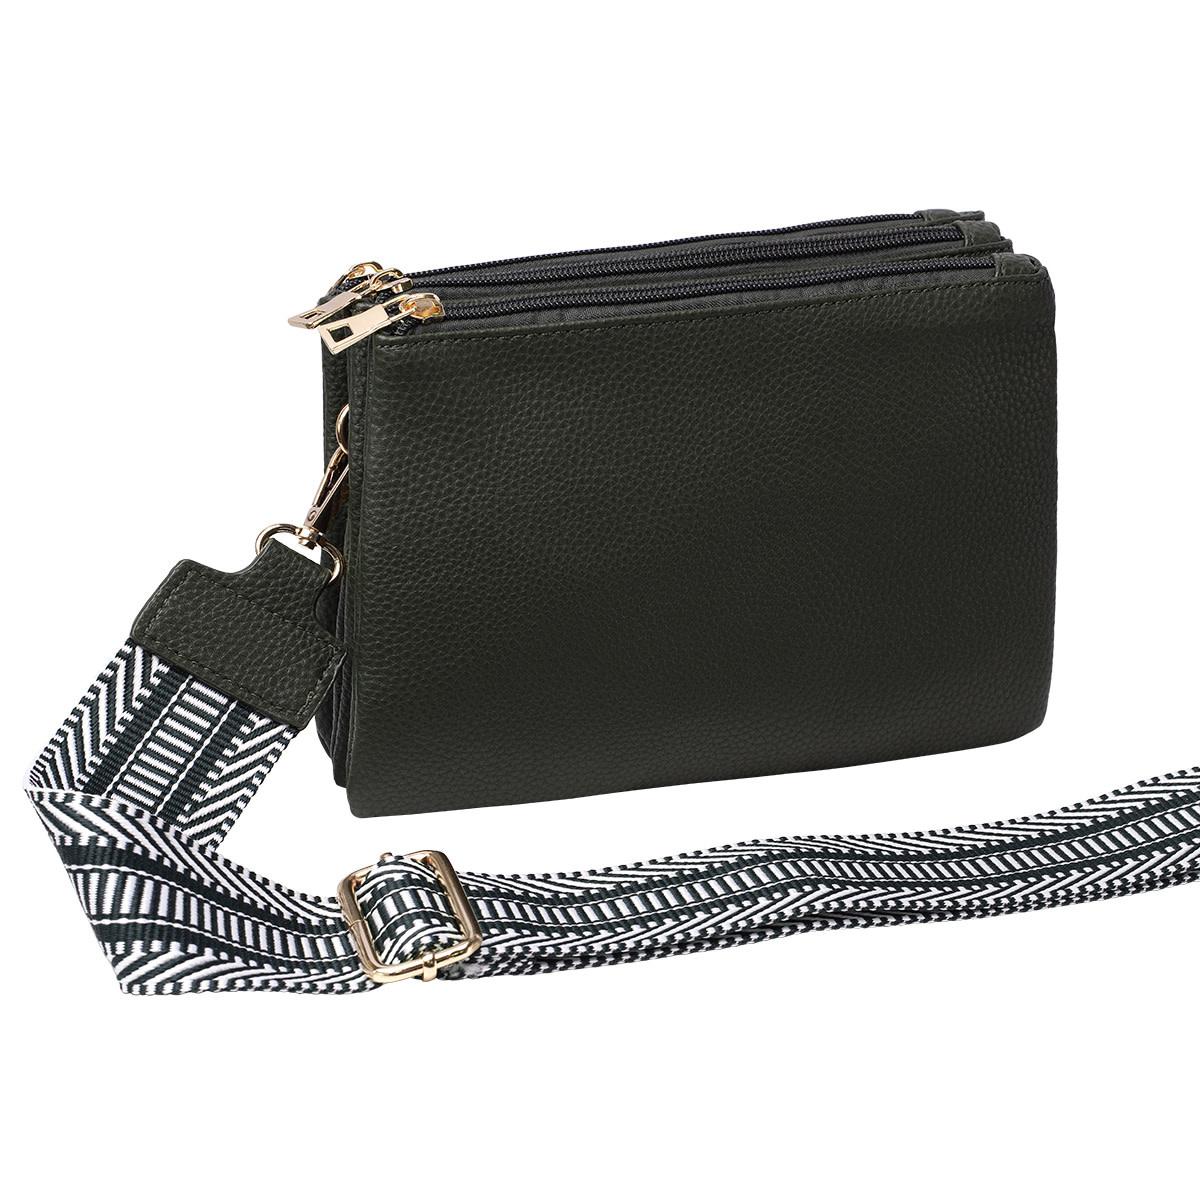 With love Bag 3 compartments - Dark green 23cm x 17cm x 5cm